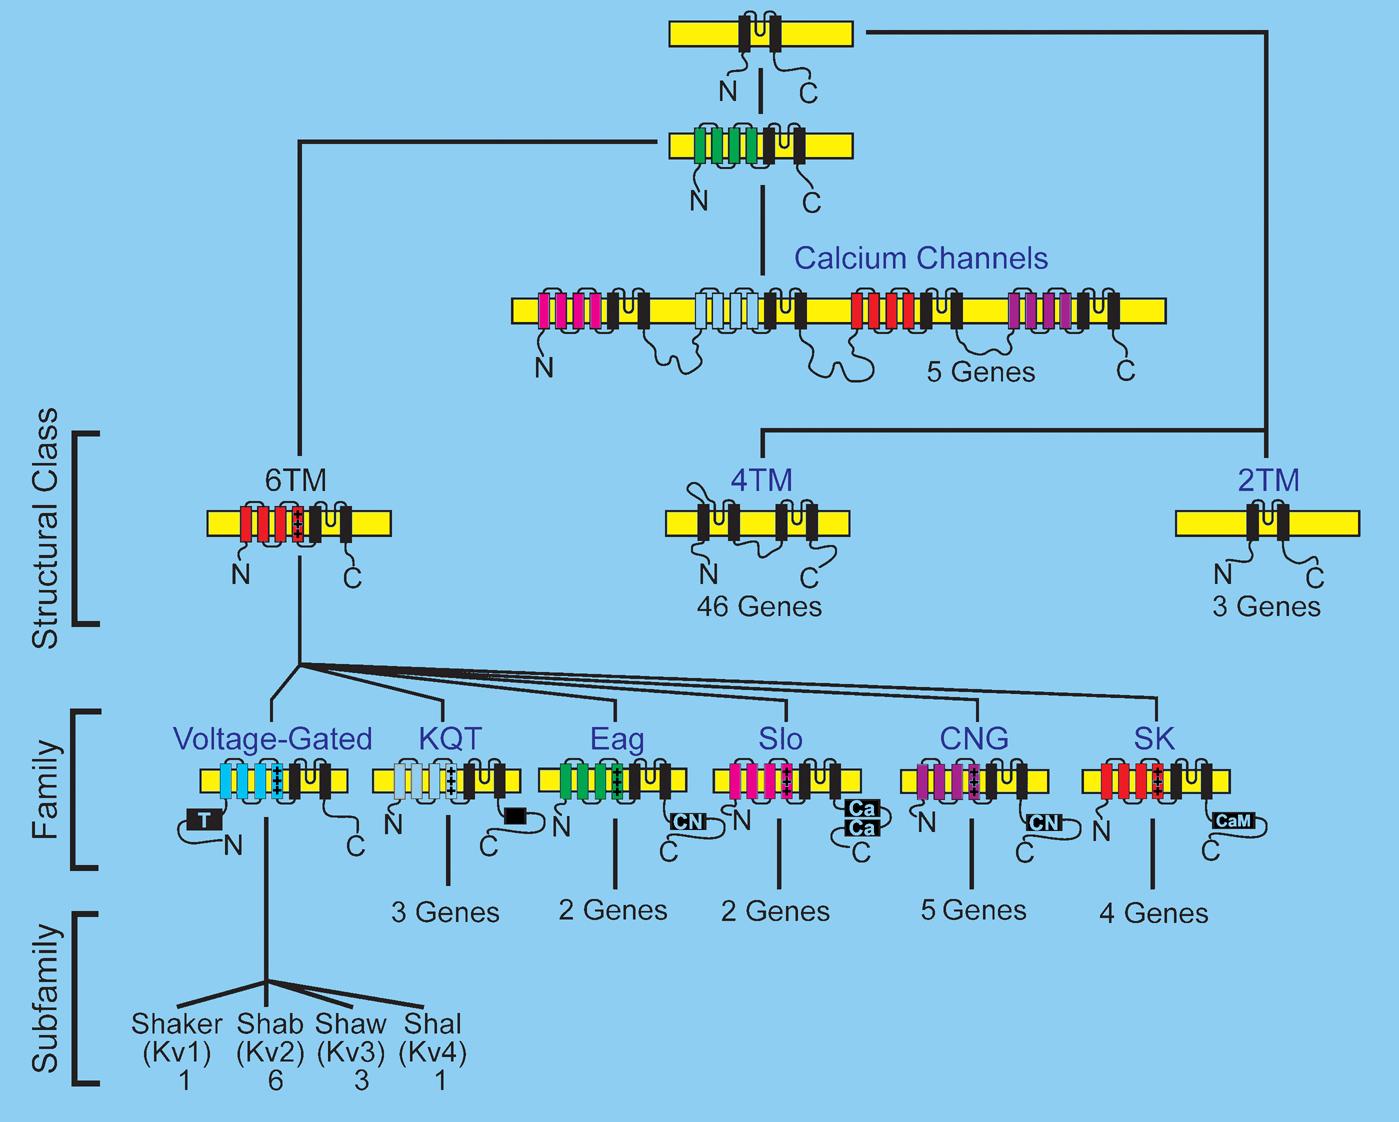 The neuronal genome of Caenorhabditis elegans